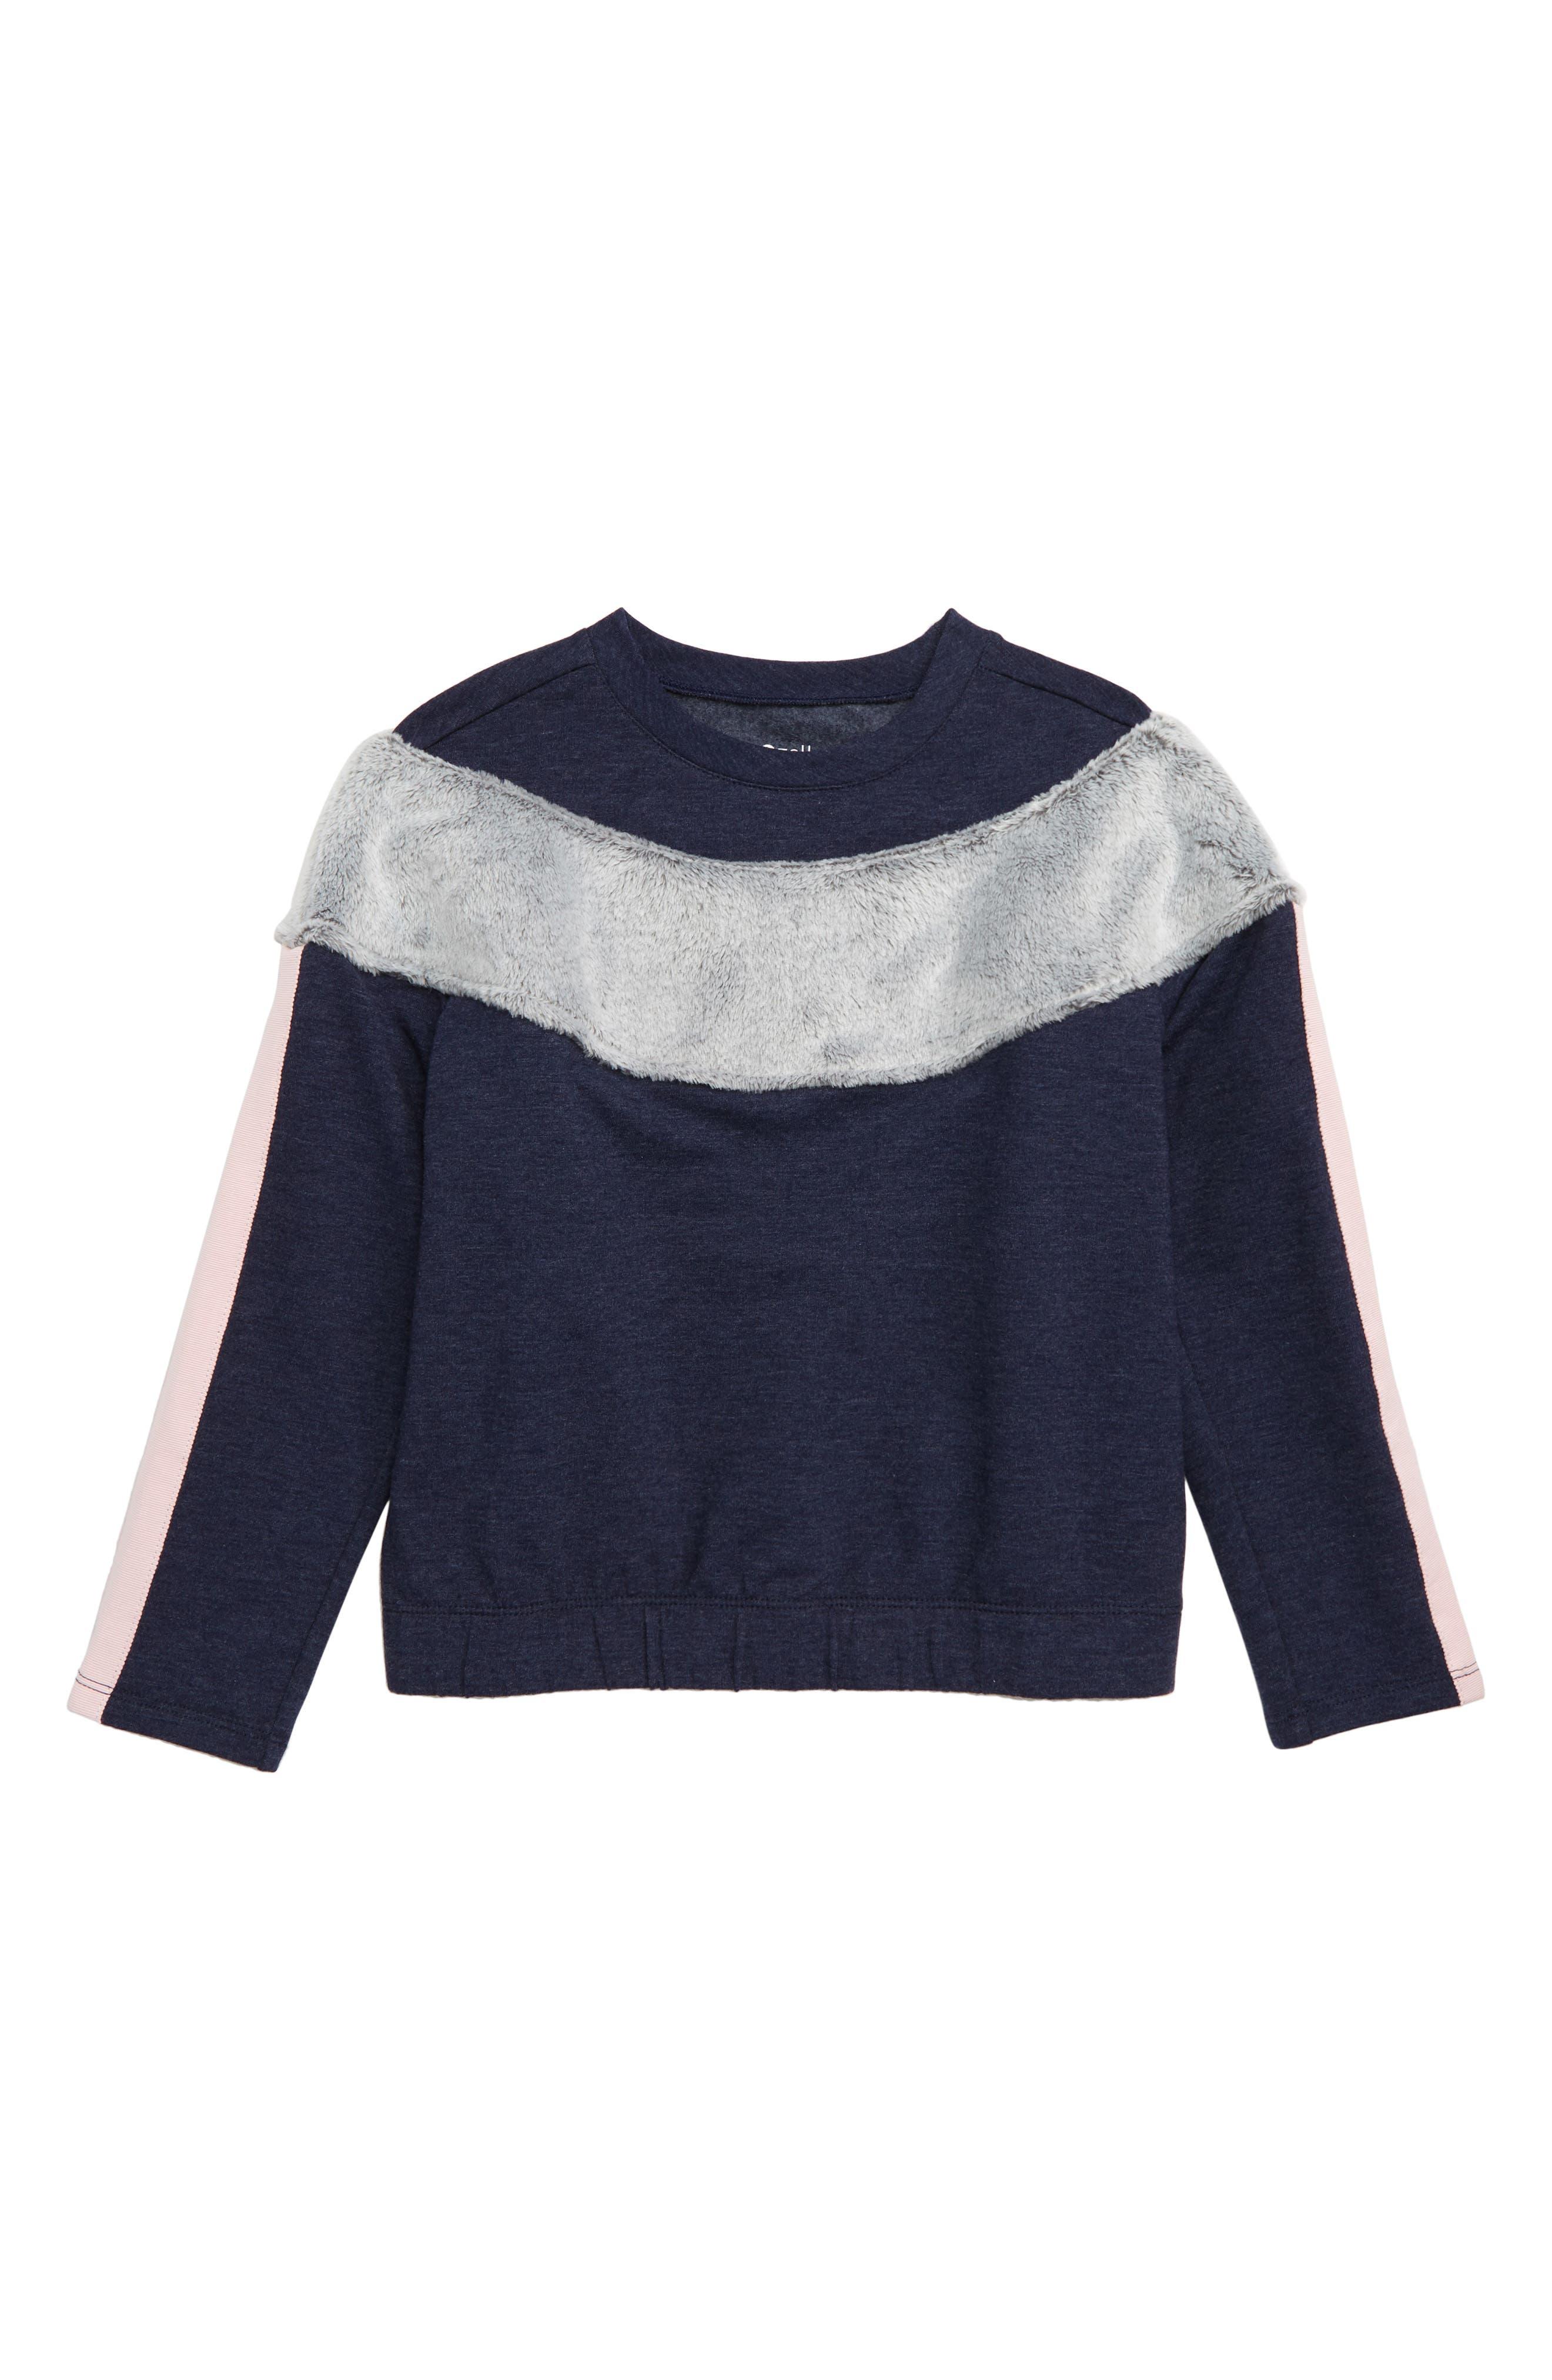 ZELLA GIRL, Sporty Stripe Fleece Sweatshirt, Main thumbnail 1, color, 410